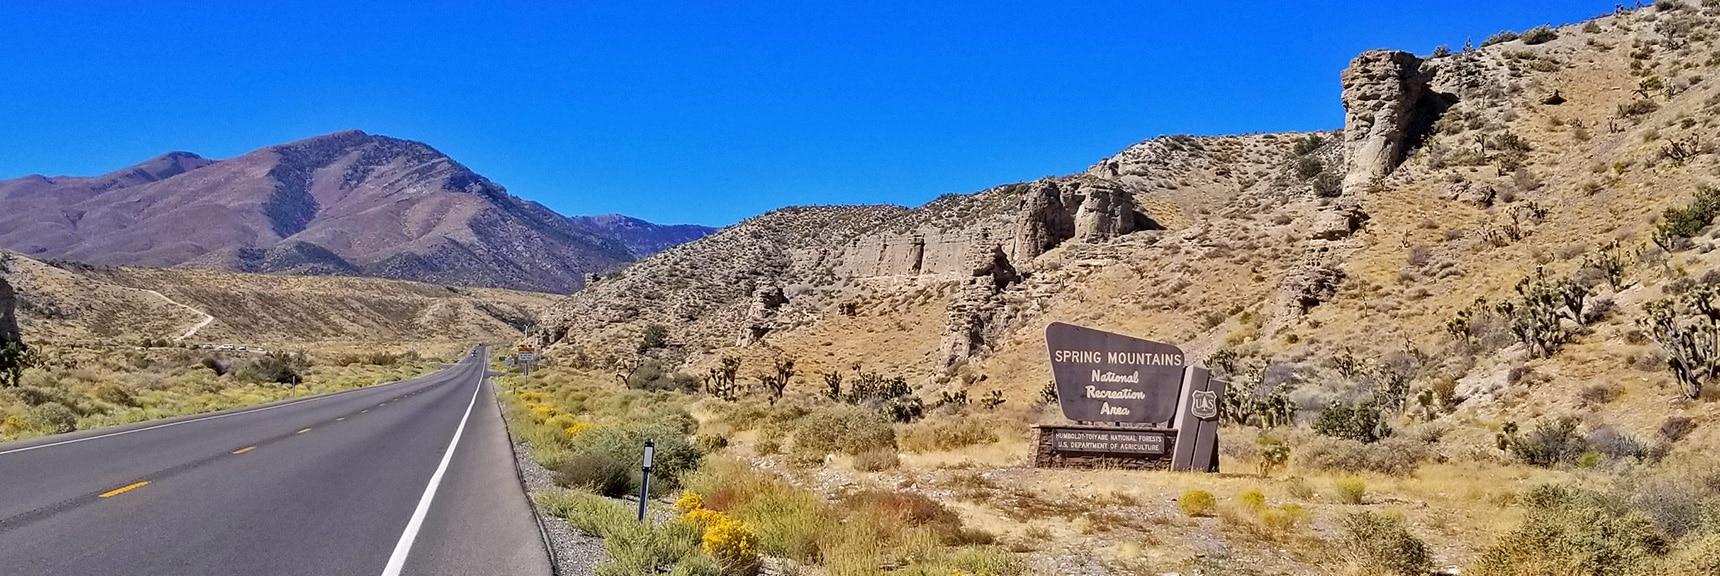 Spring Mountains Entrance on Kyle Canyon Rd | Harris Springs Canyon | Biking from Centennial Hills | Spring Mountains, Nevada